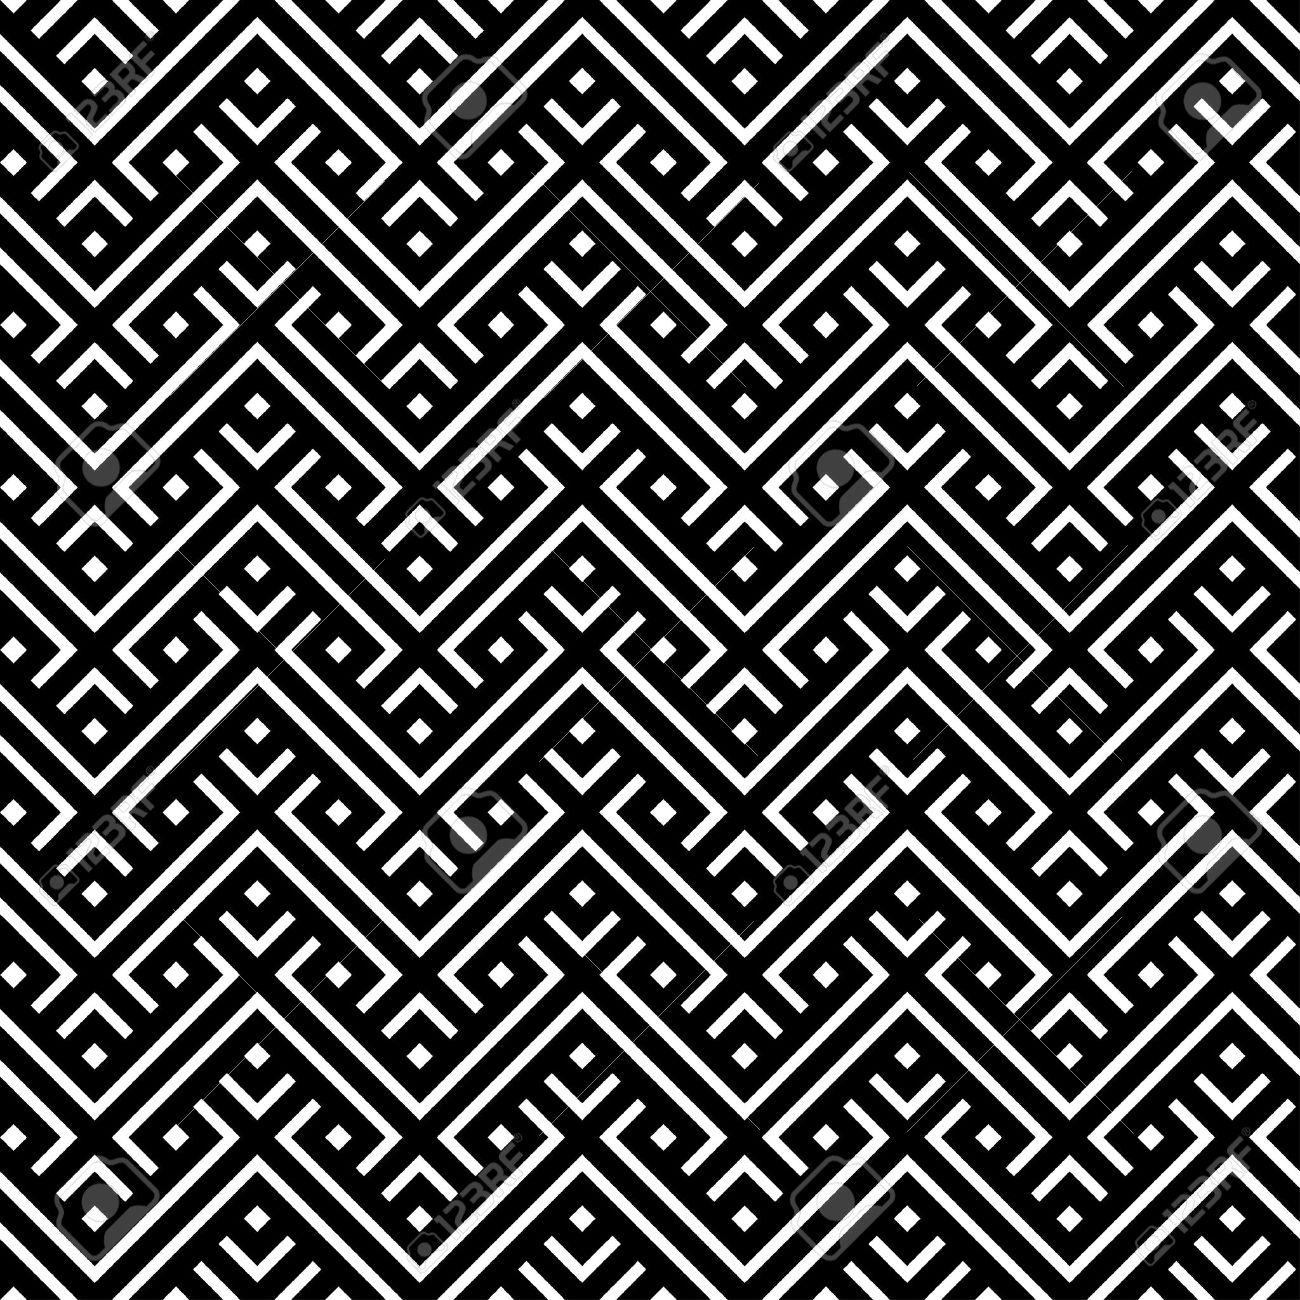 Vector of moroccan tile seamless pattern tile for design tile - Seamless Pattern For A Fabric Papers Tiles Stock Vector 15247110